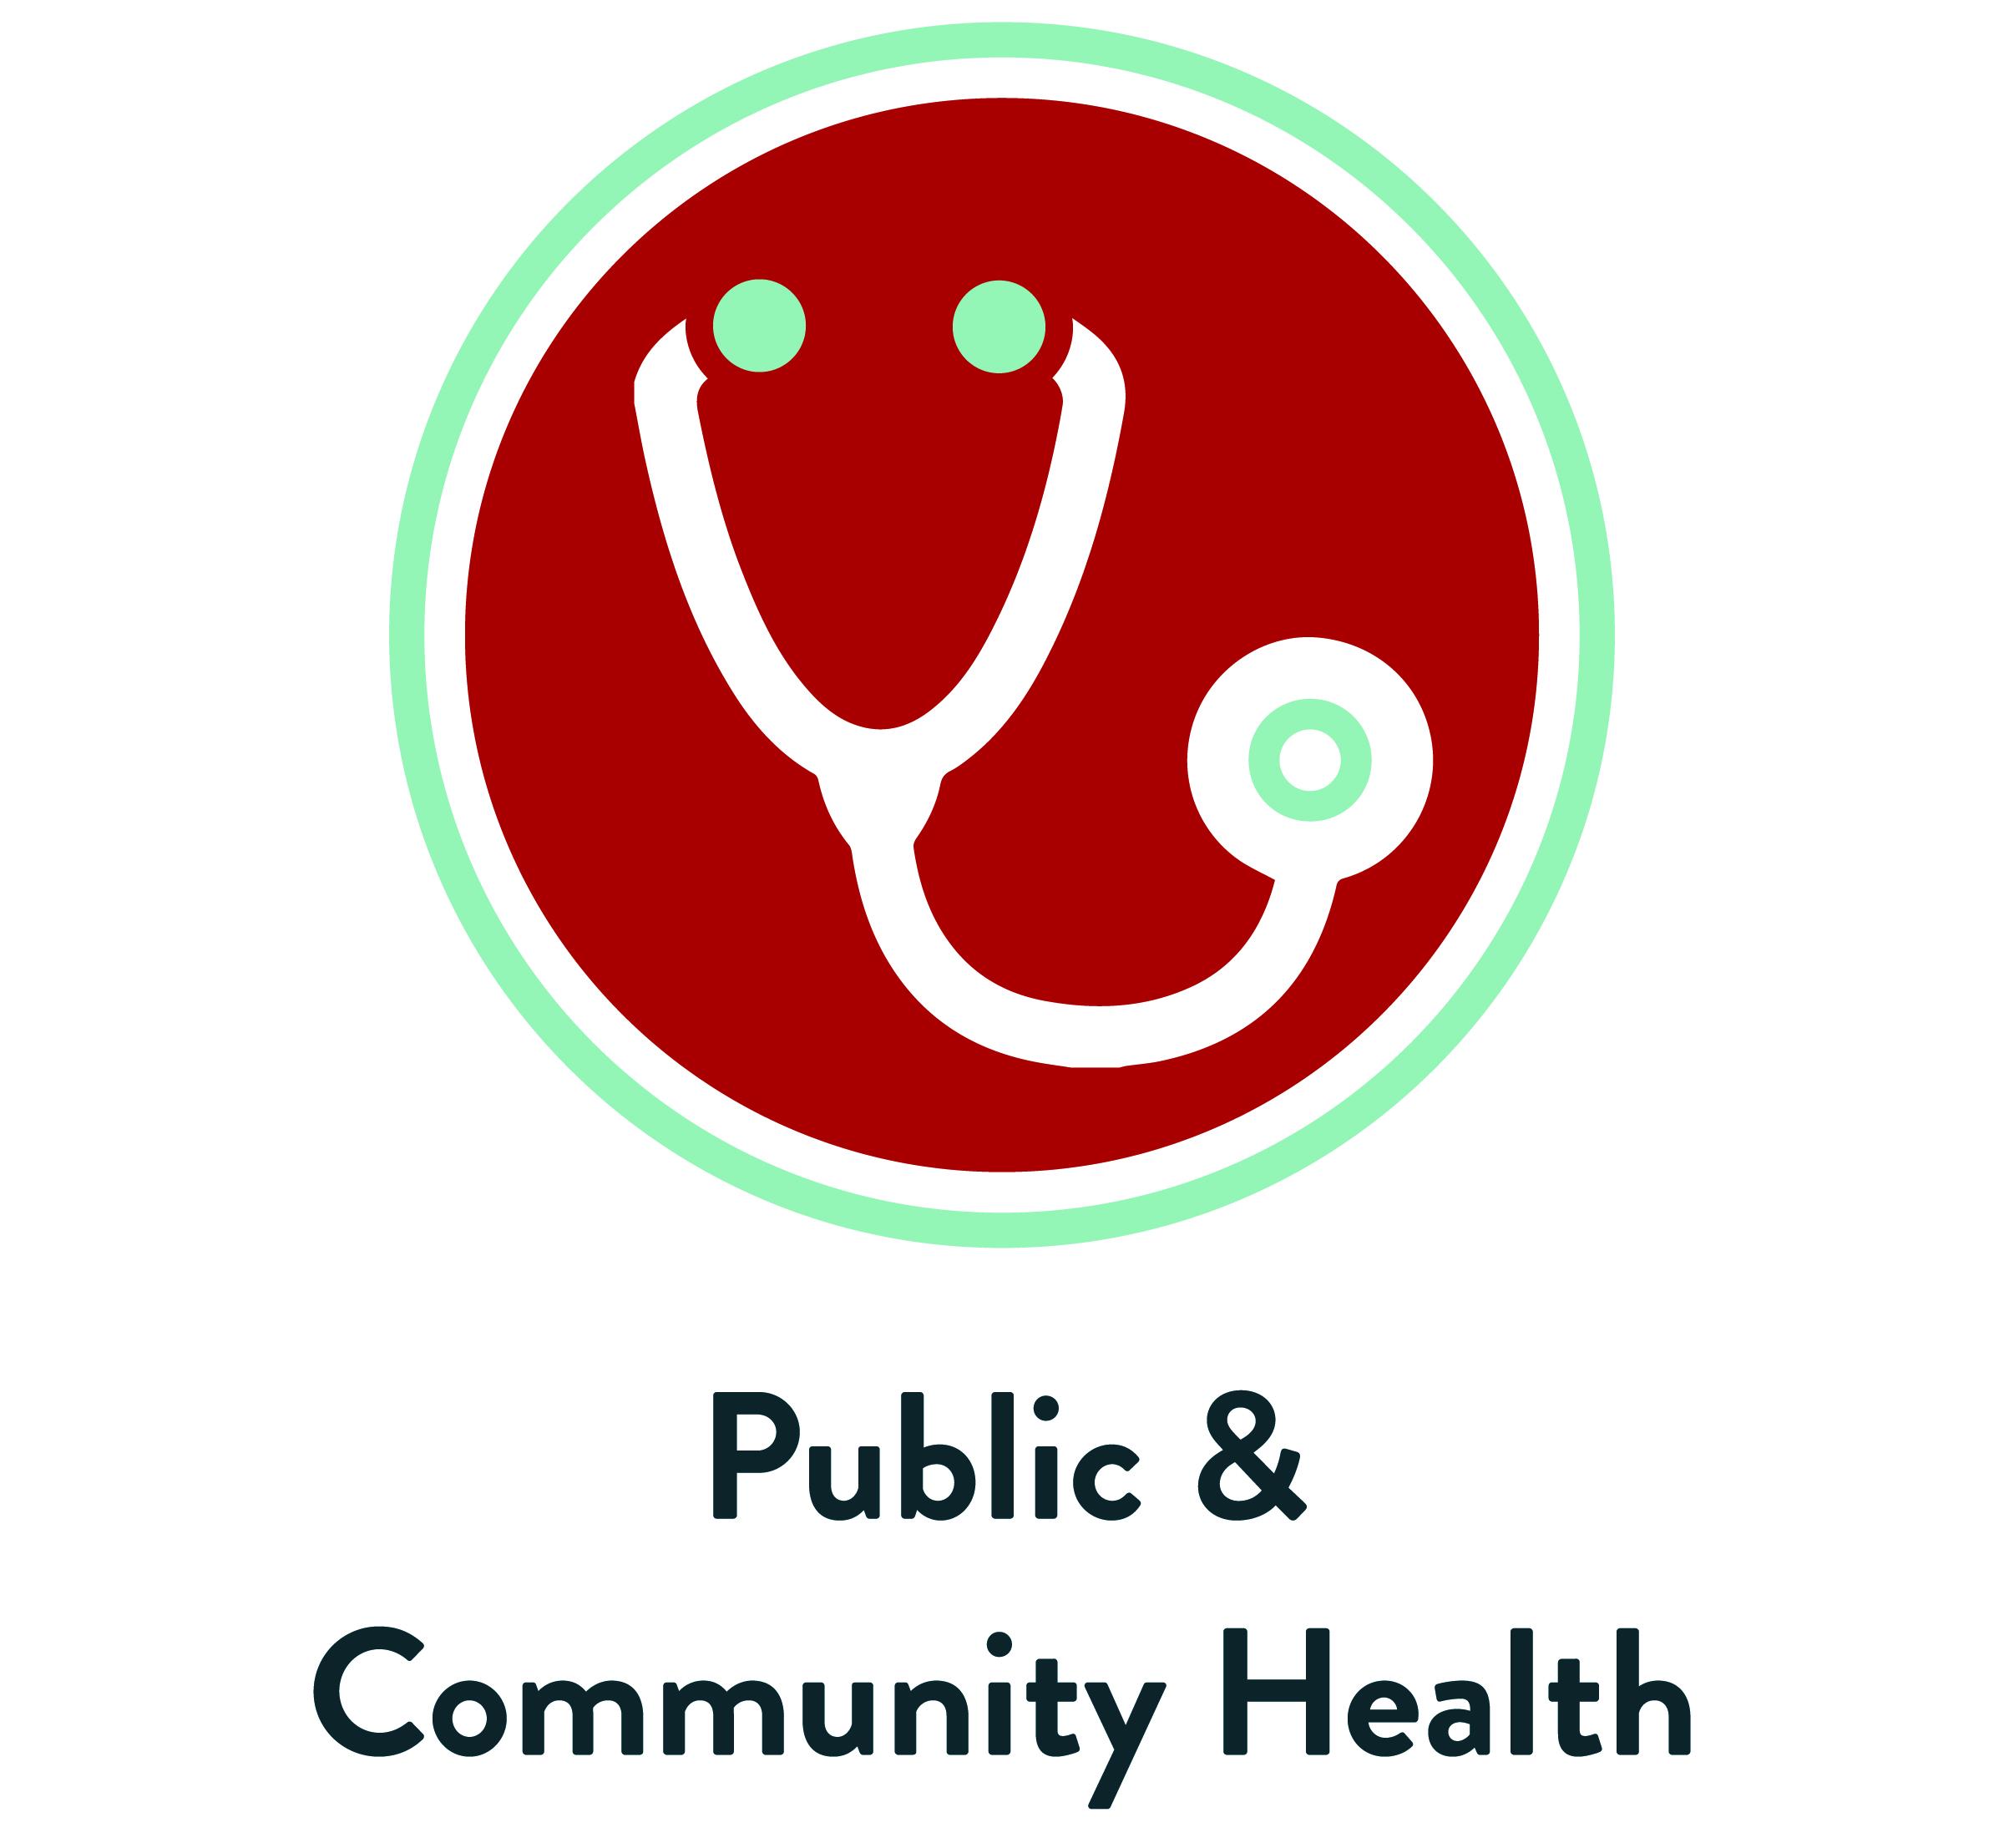 Public & Community Health